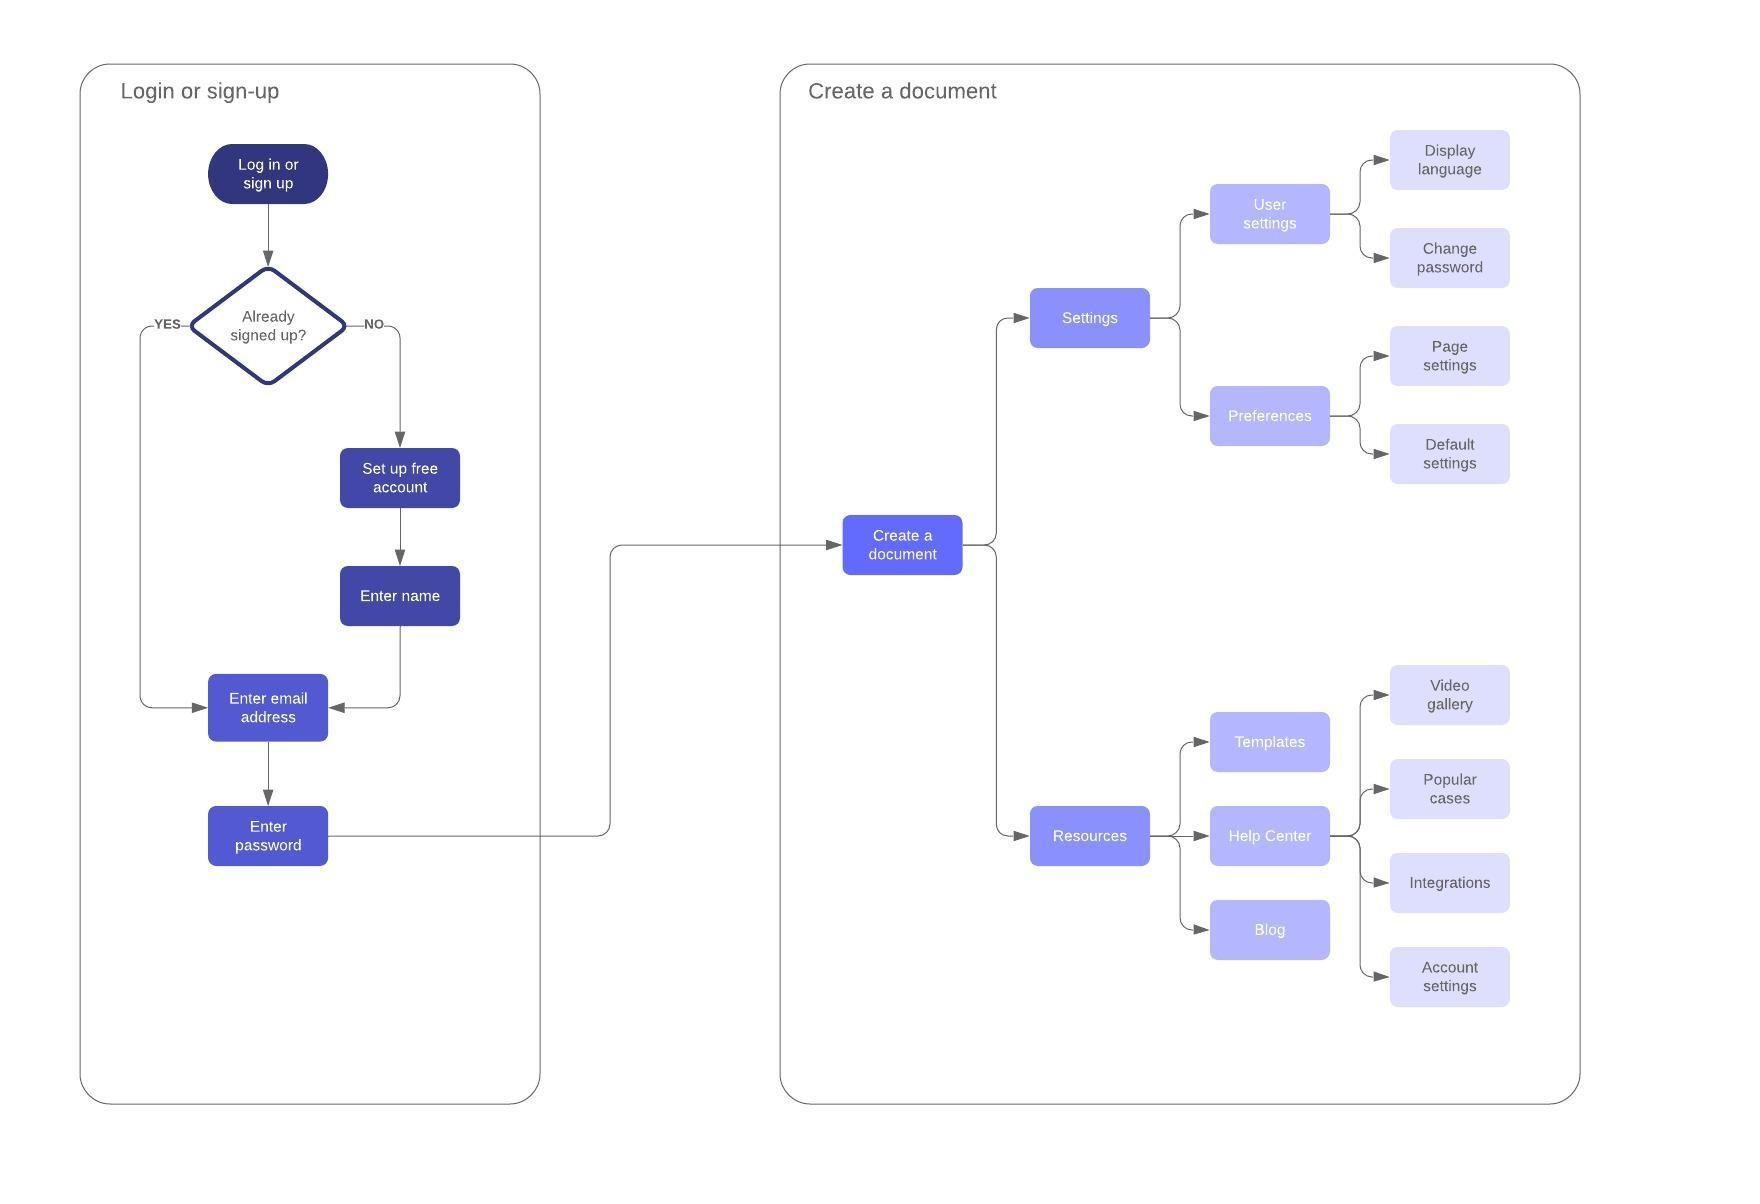 009 Amazing Free Flowchart Template Word High Resolution  Proces MicrosoftFull